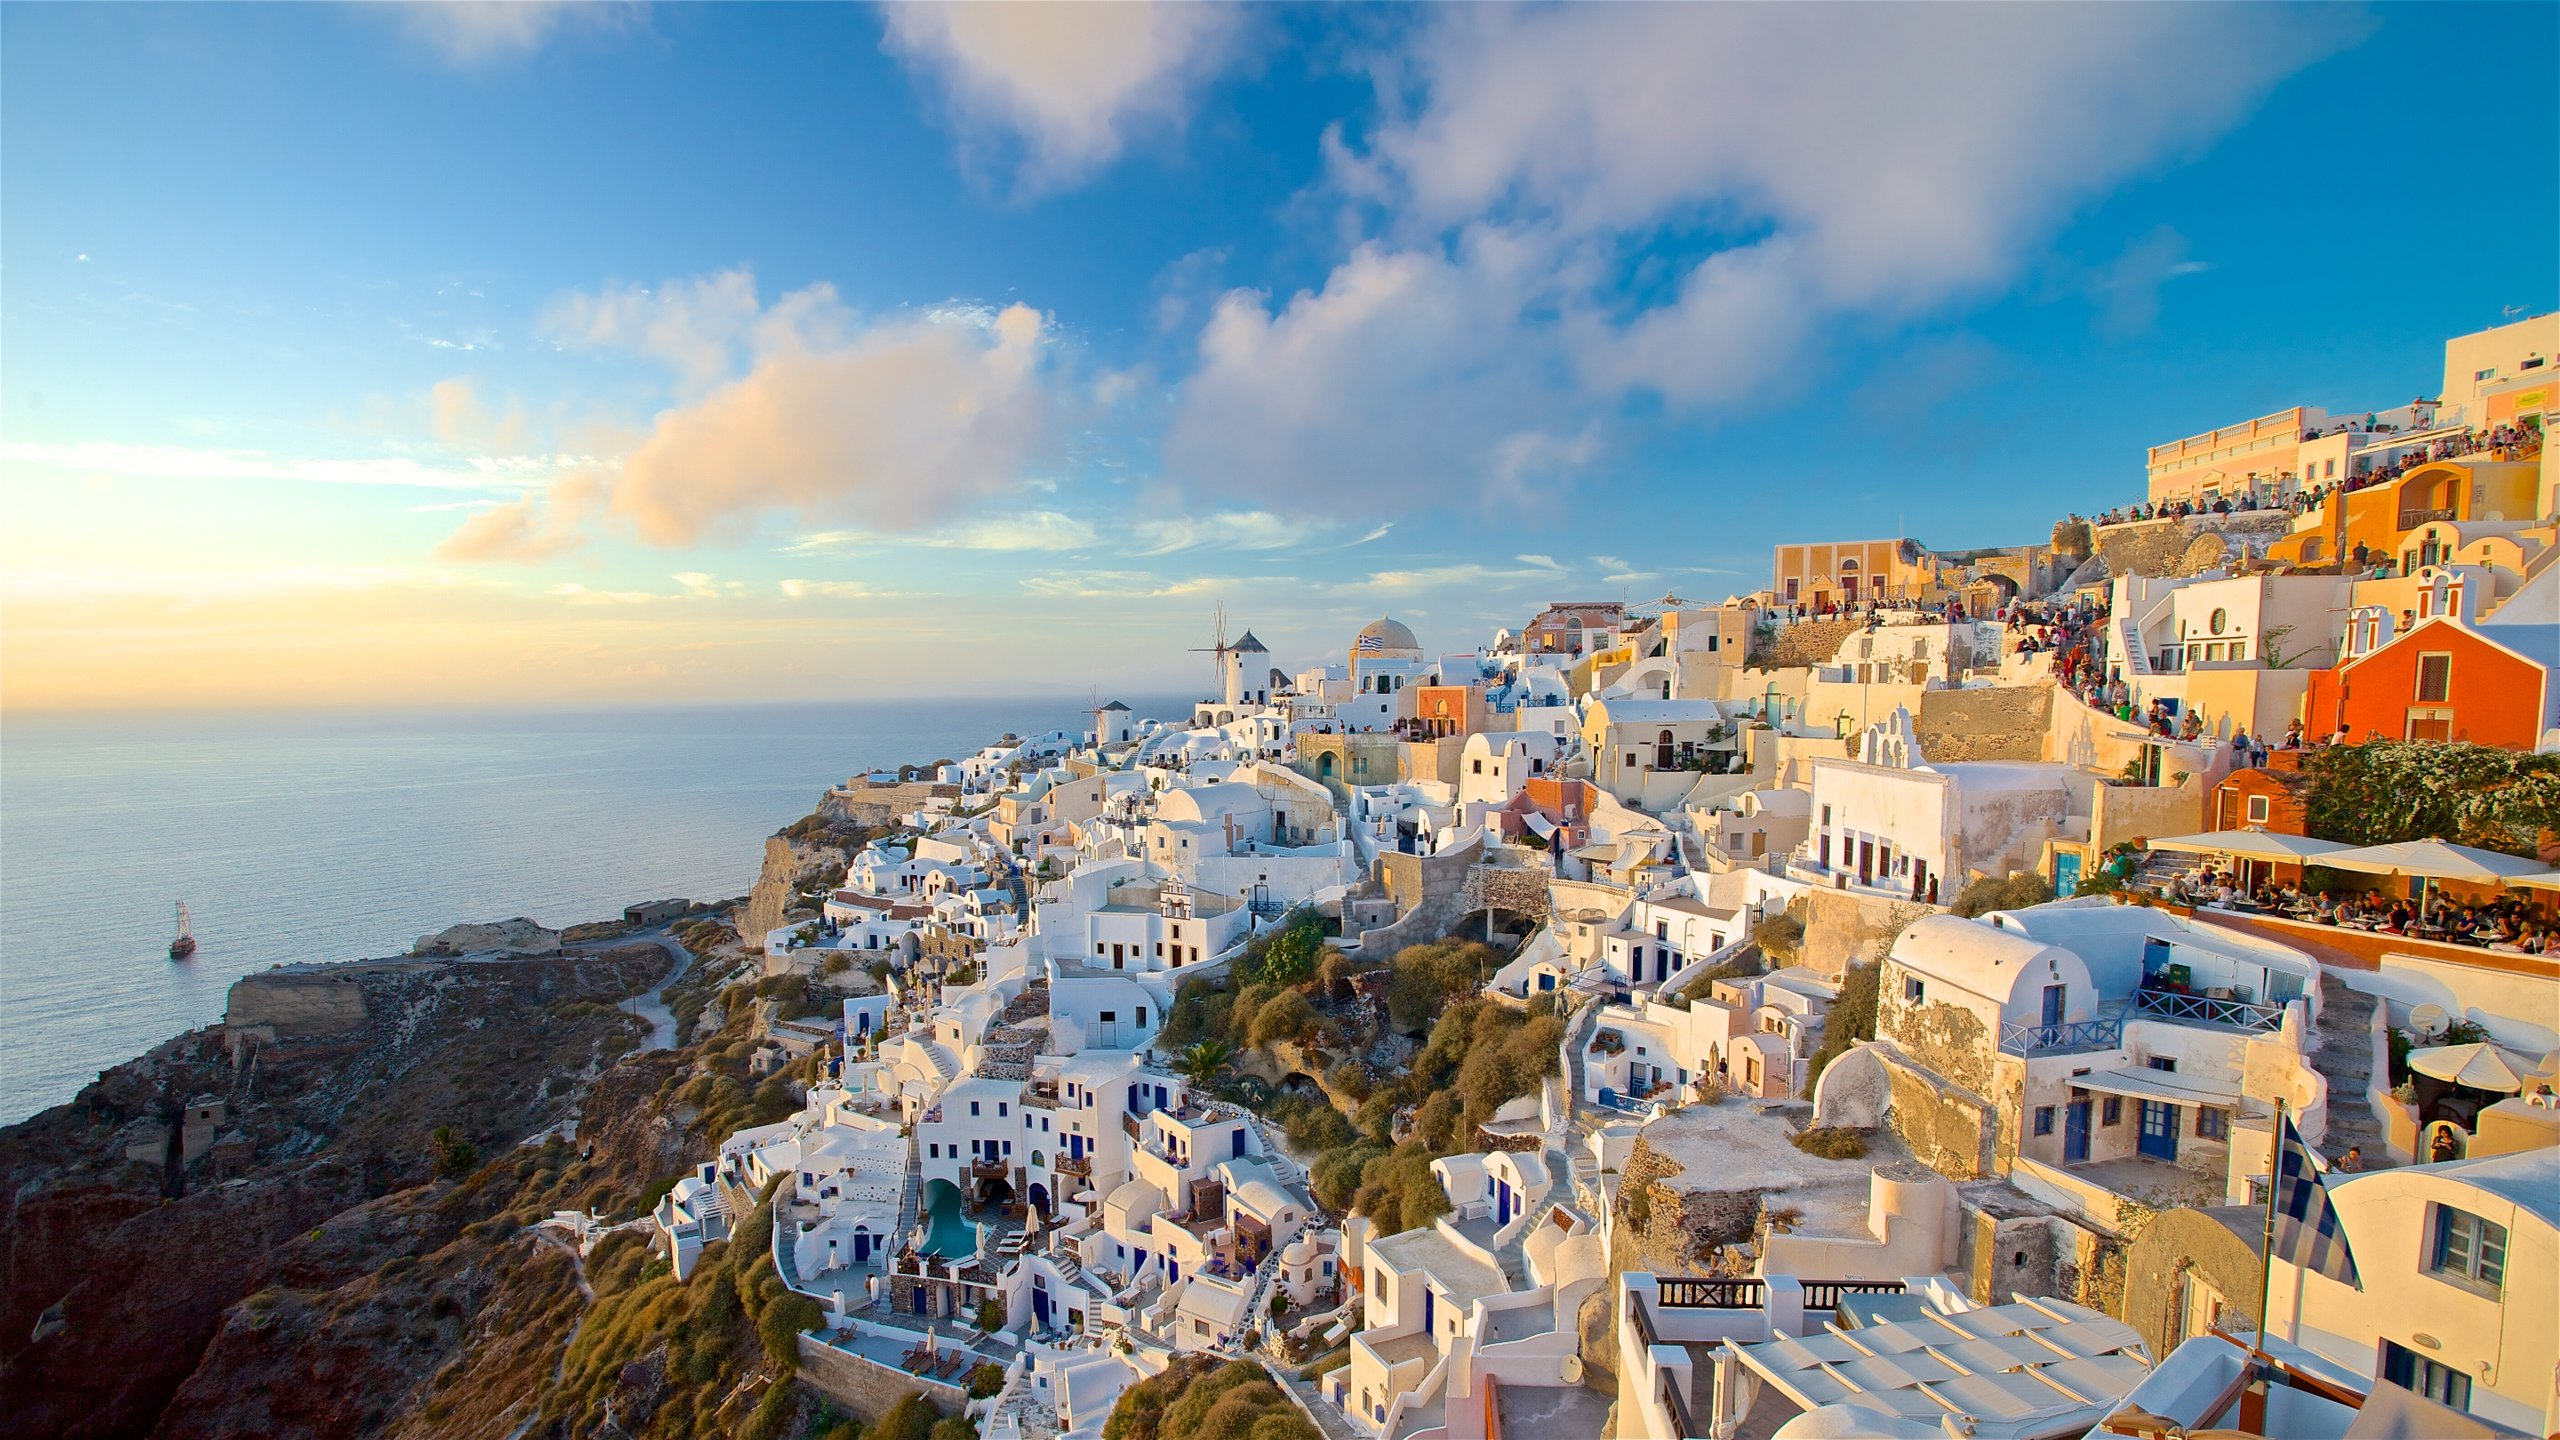 10 Best Hotel Wedding Venues in Greek Islands for 2019 ...